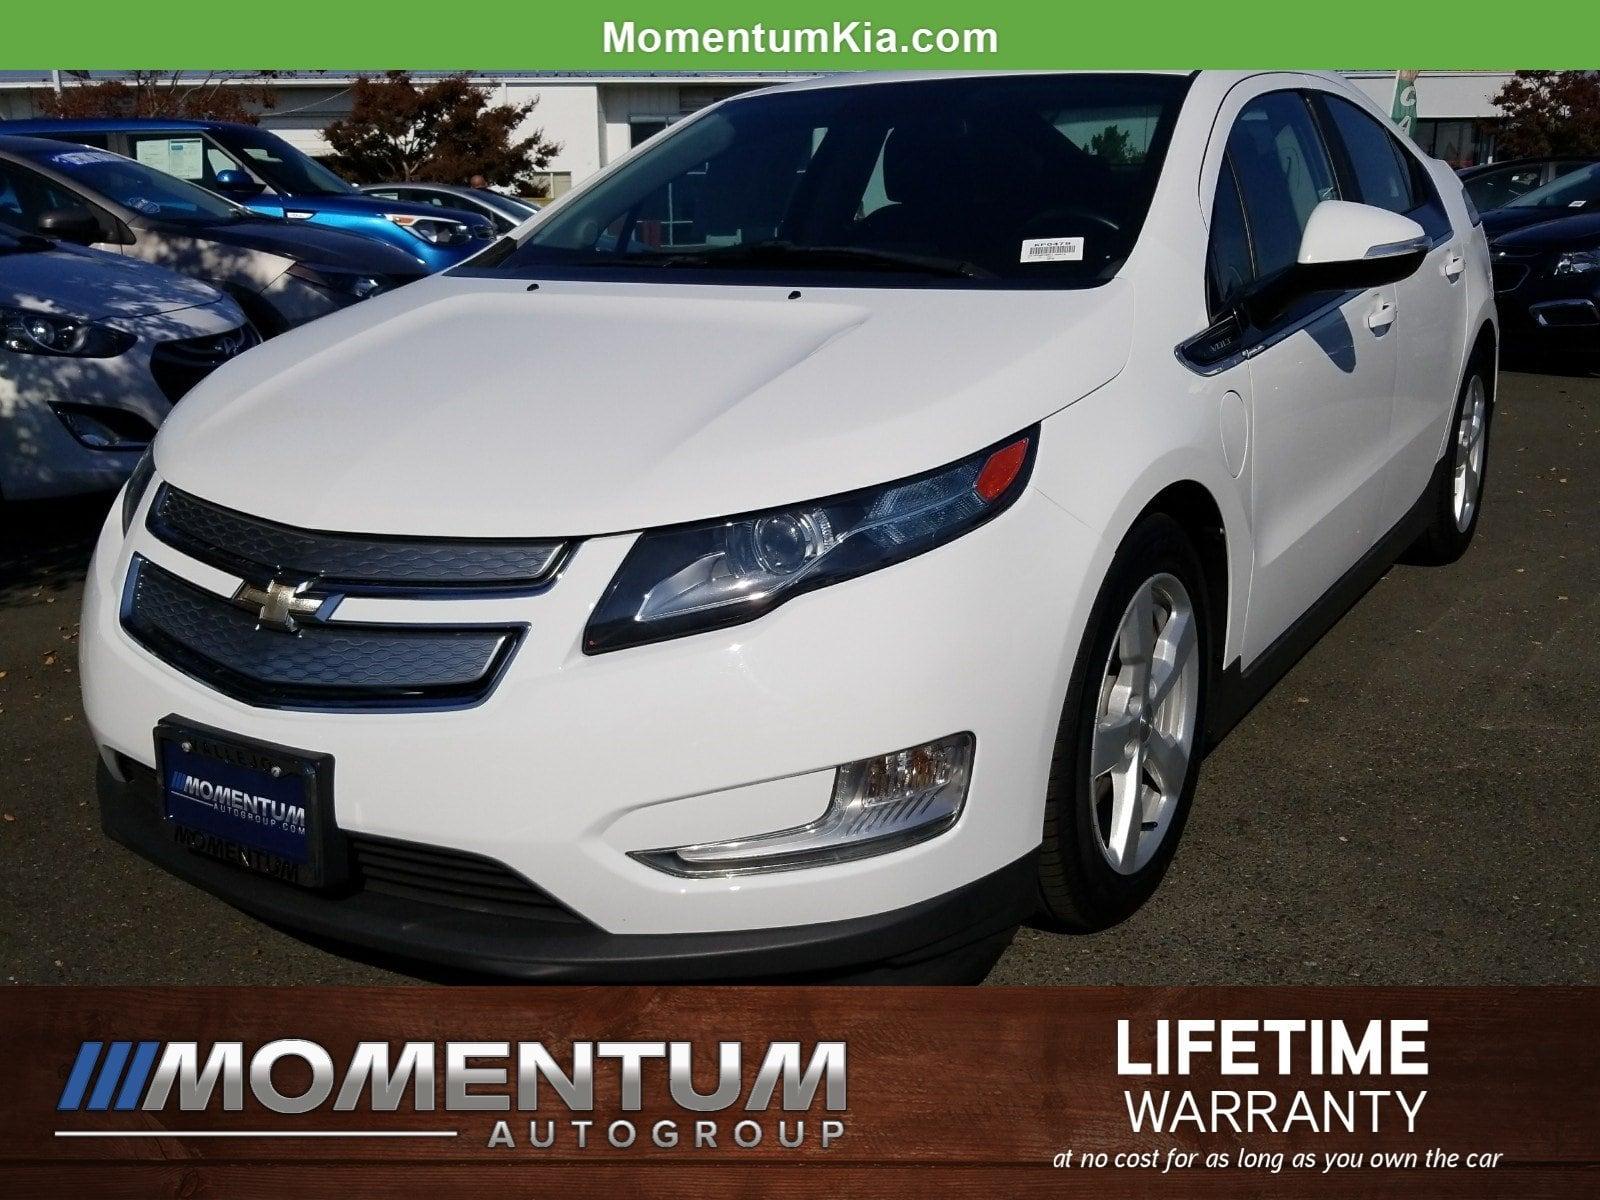 Used 2014 Chevrolet Volt Base Hatchback in Fairfield CA